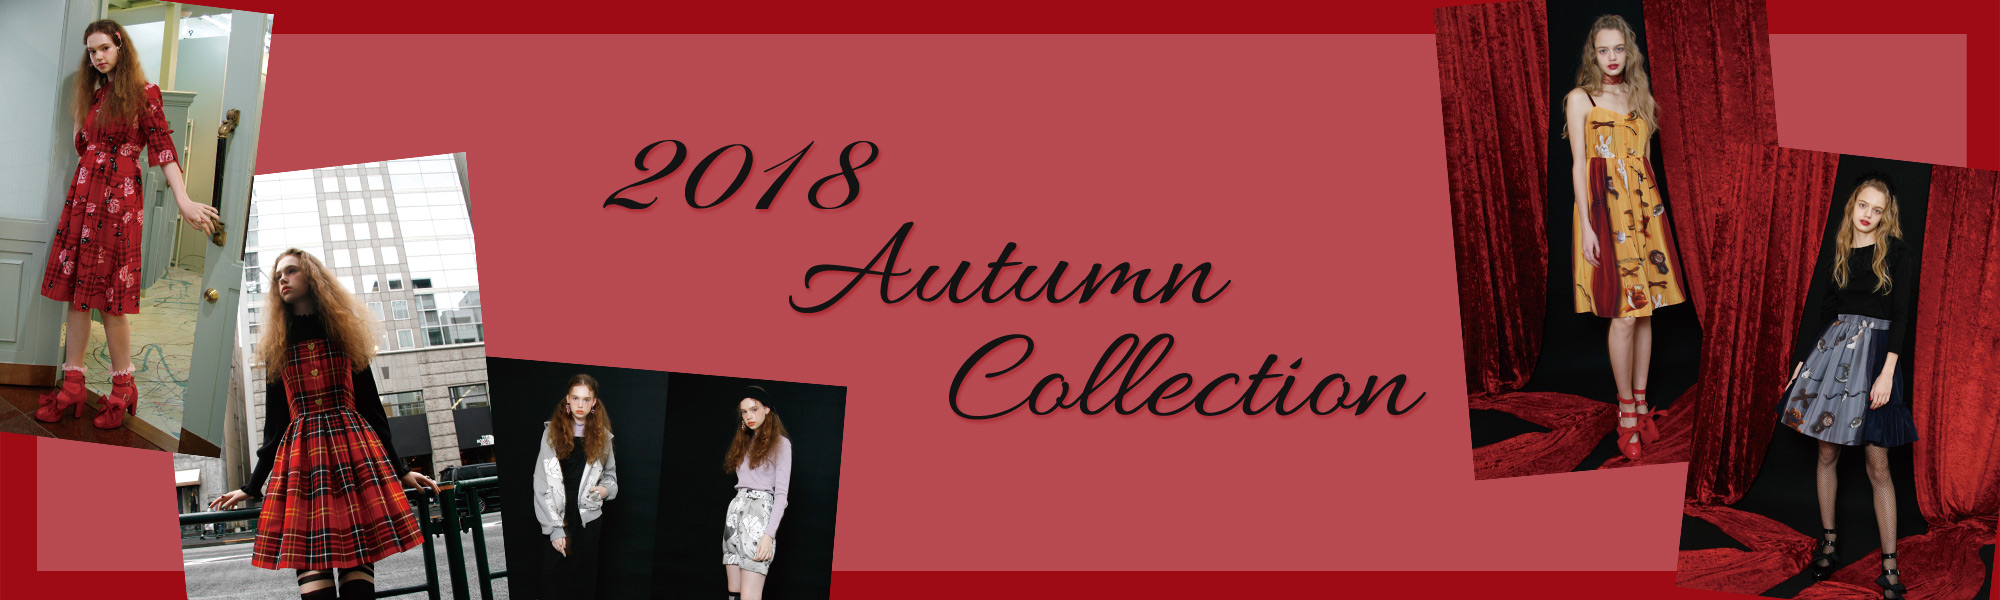 2018 Autumn Collection